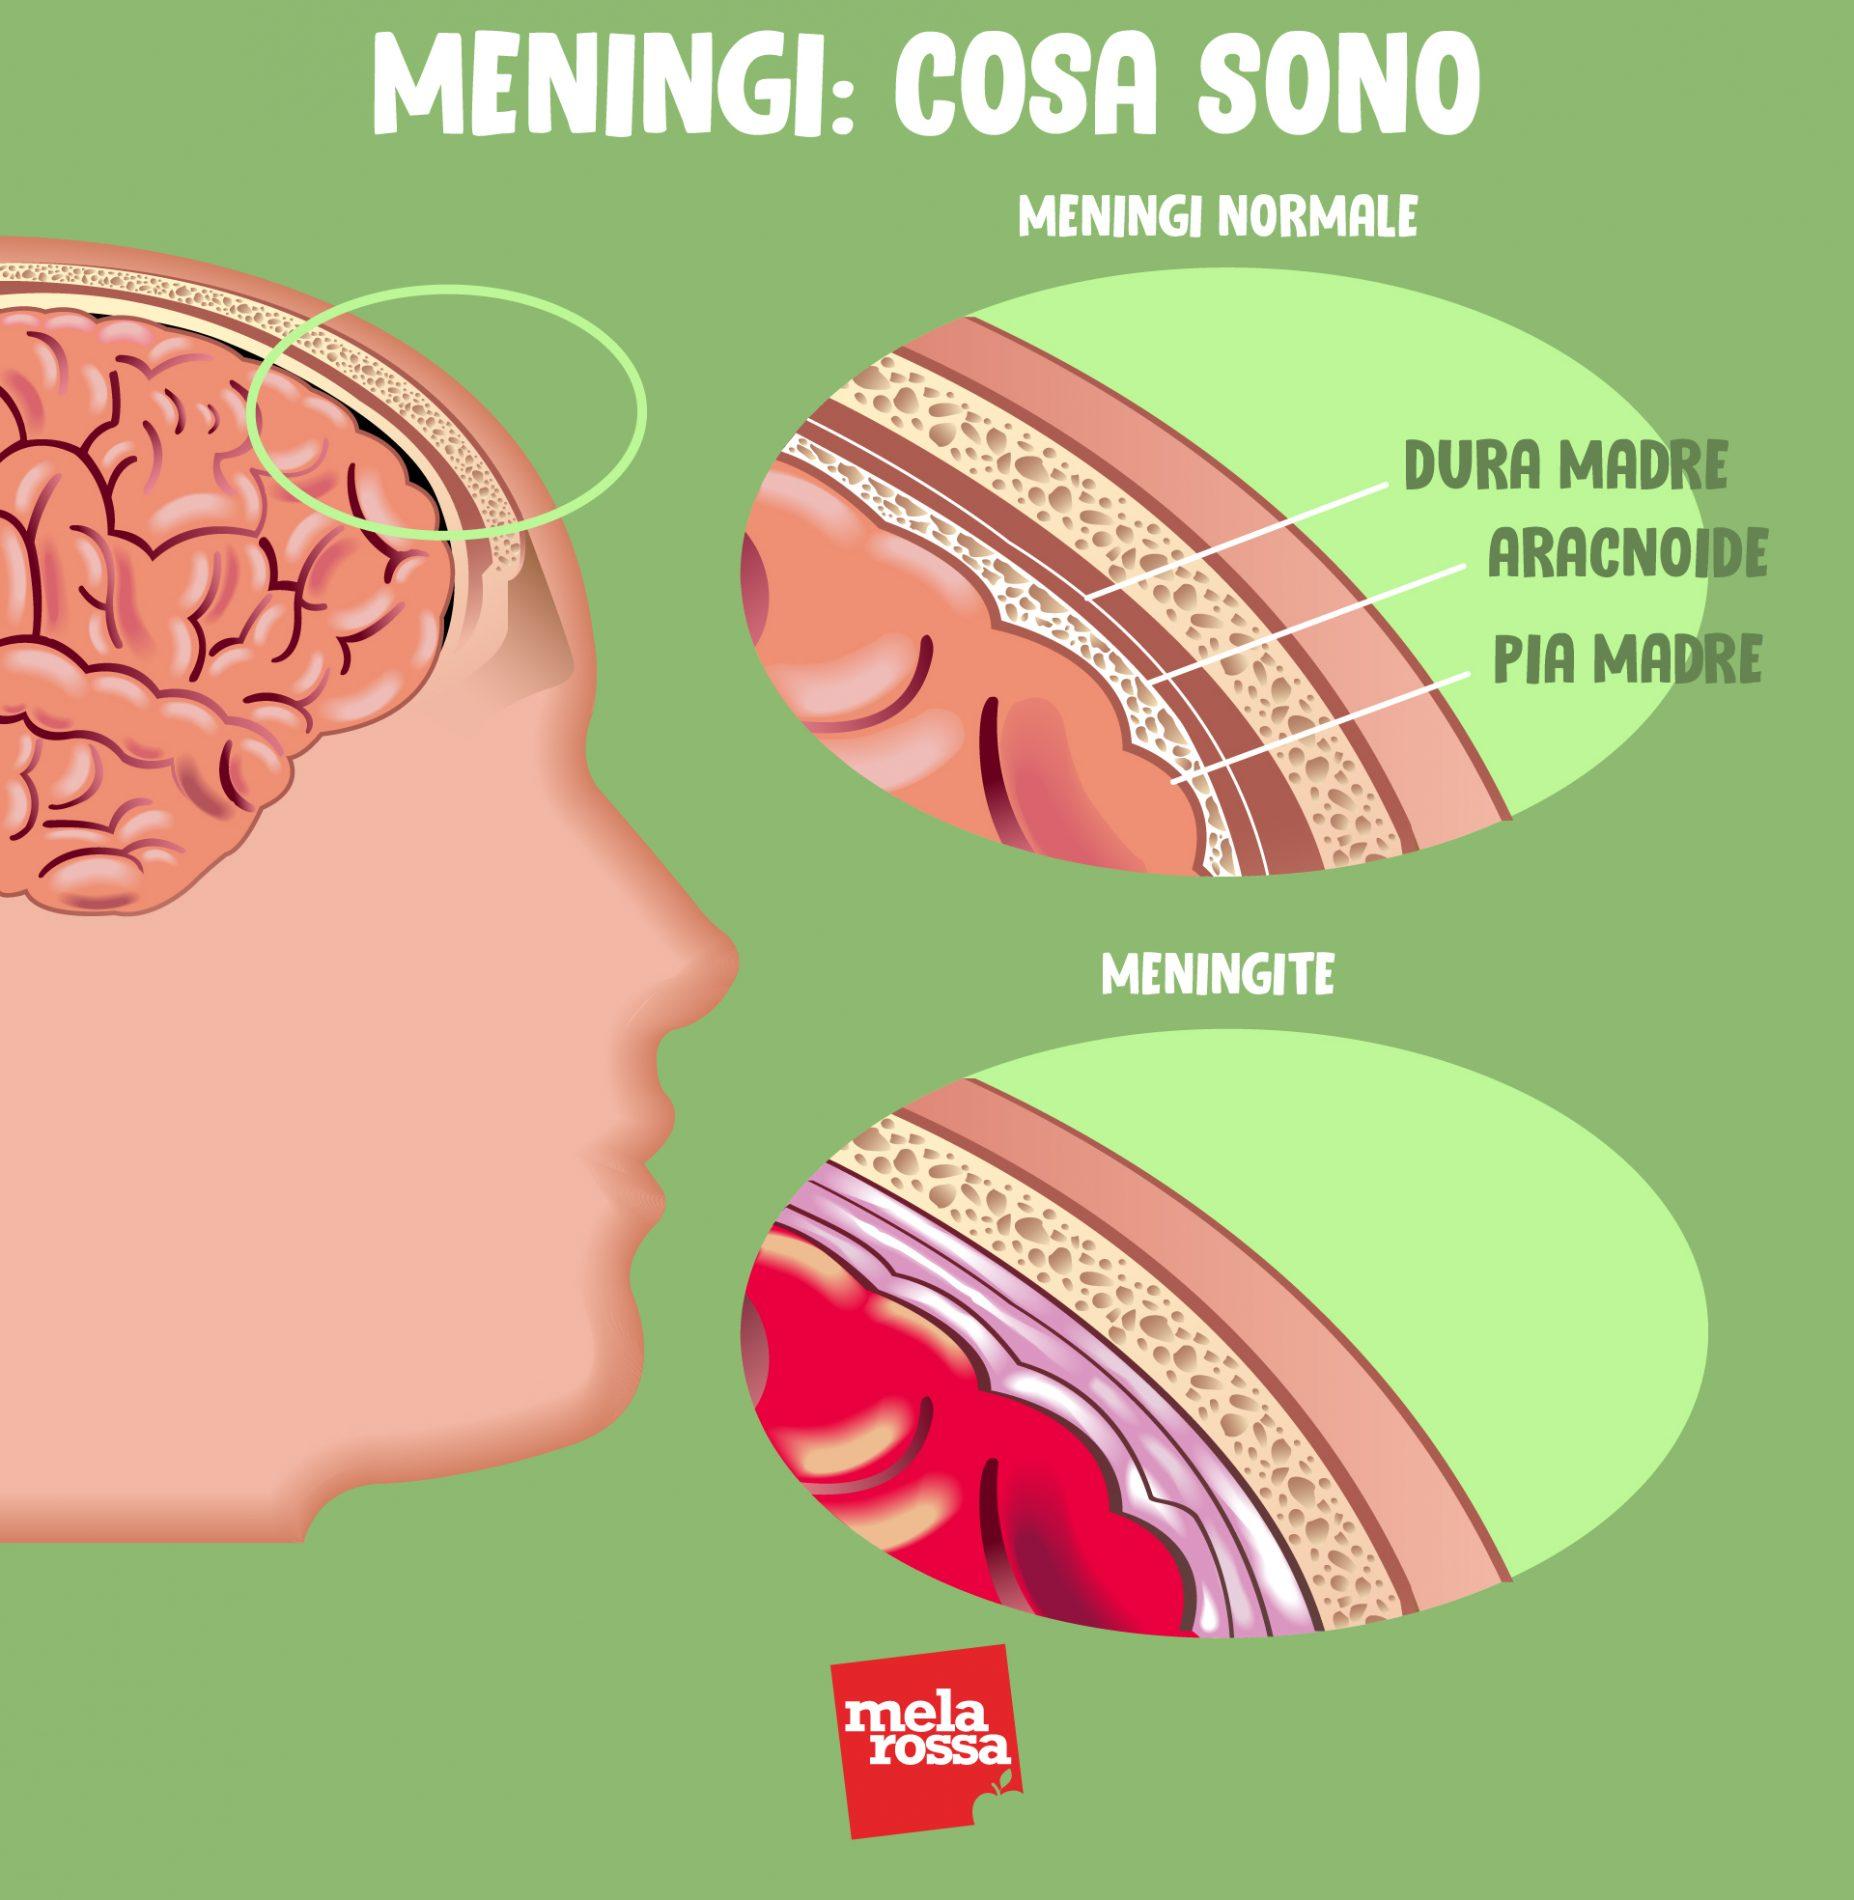 meningi e meningite